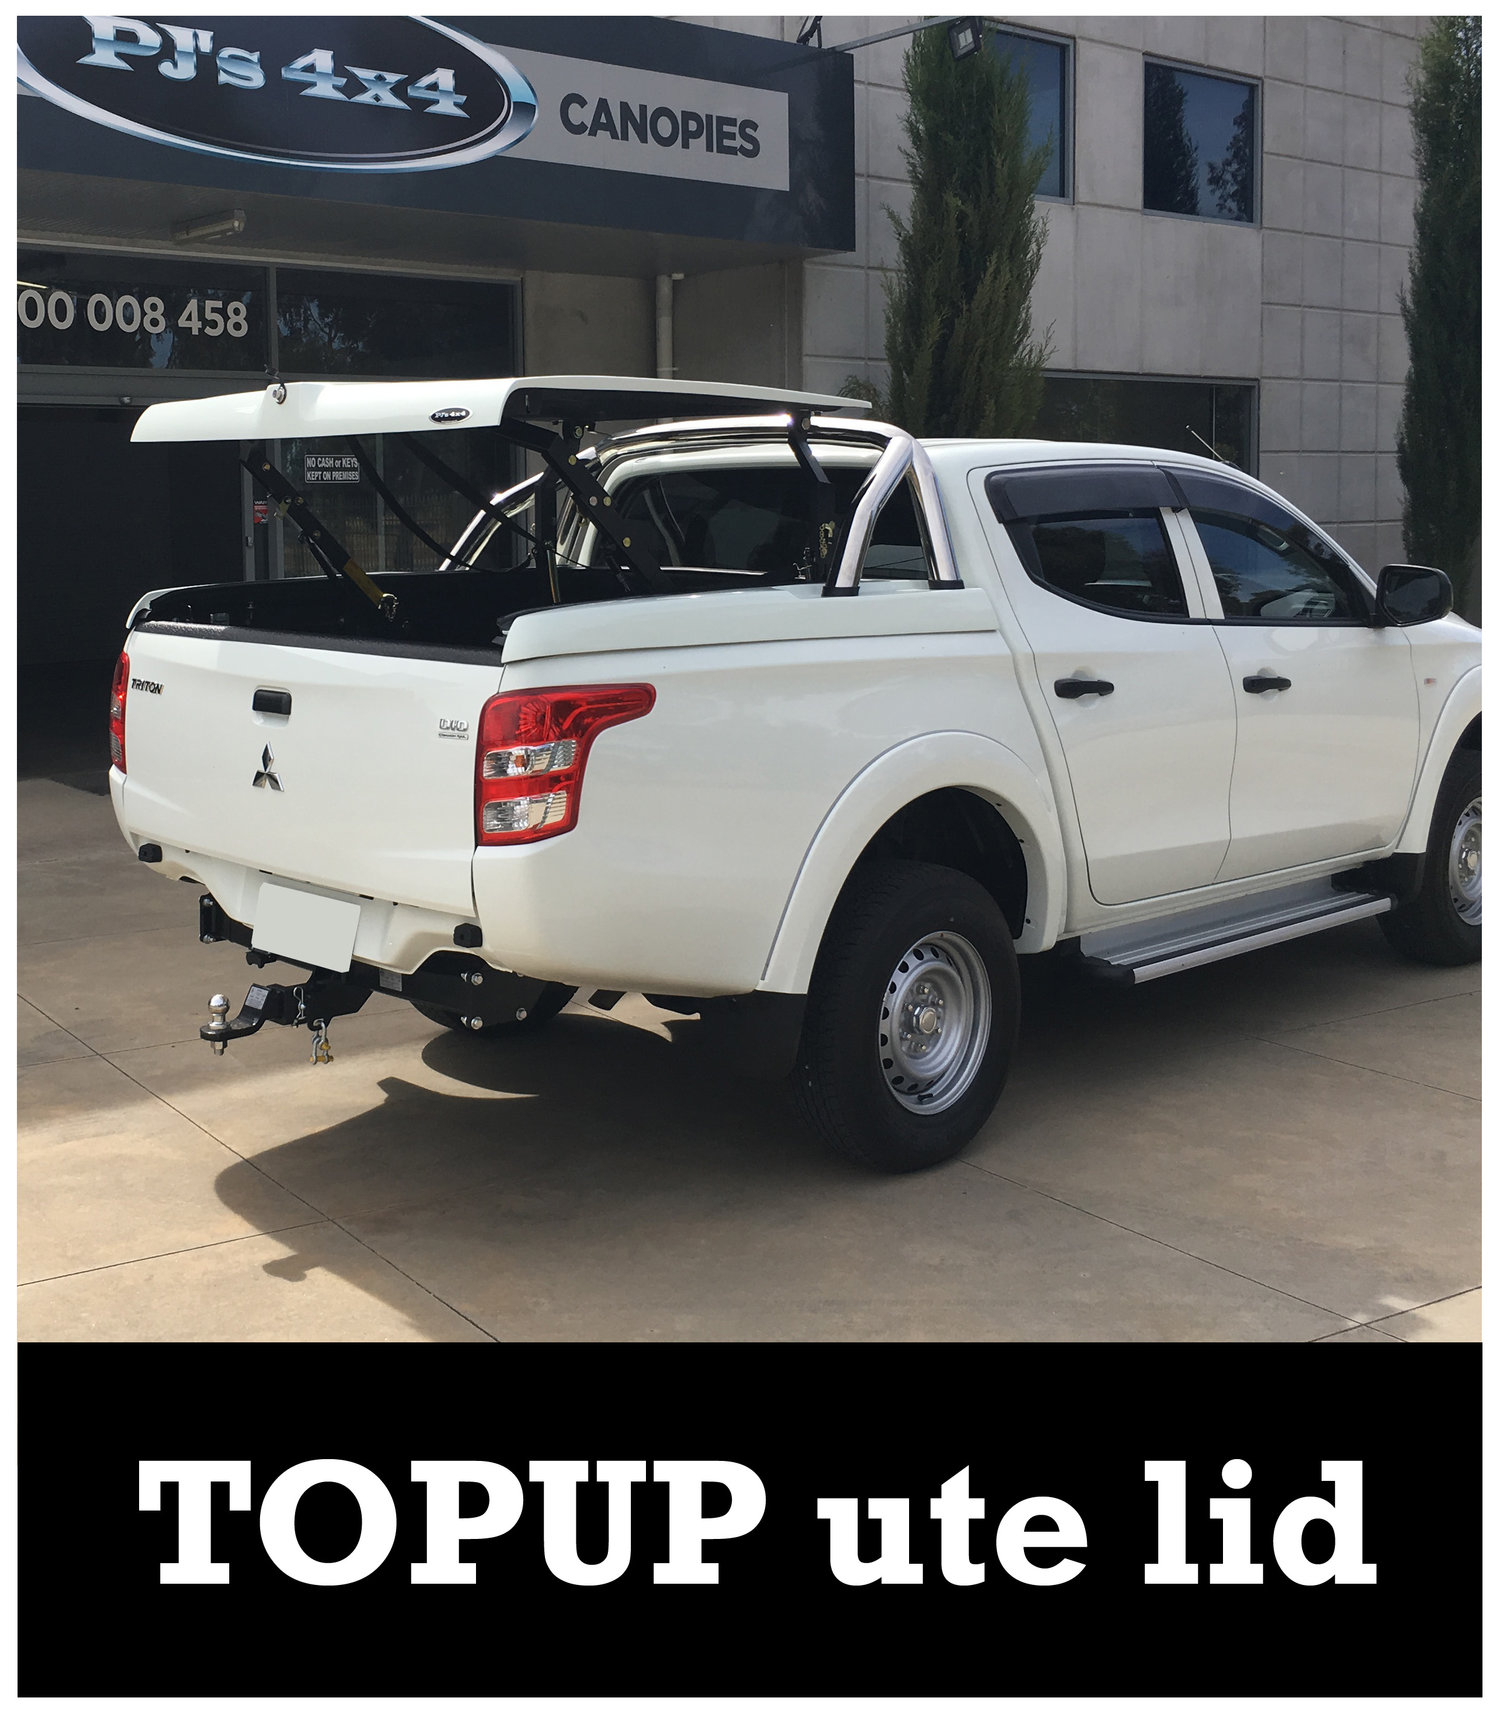 Mitsubishi Triton Canopy | Sports Lid | UTE Lids